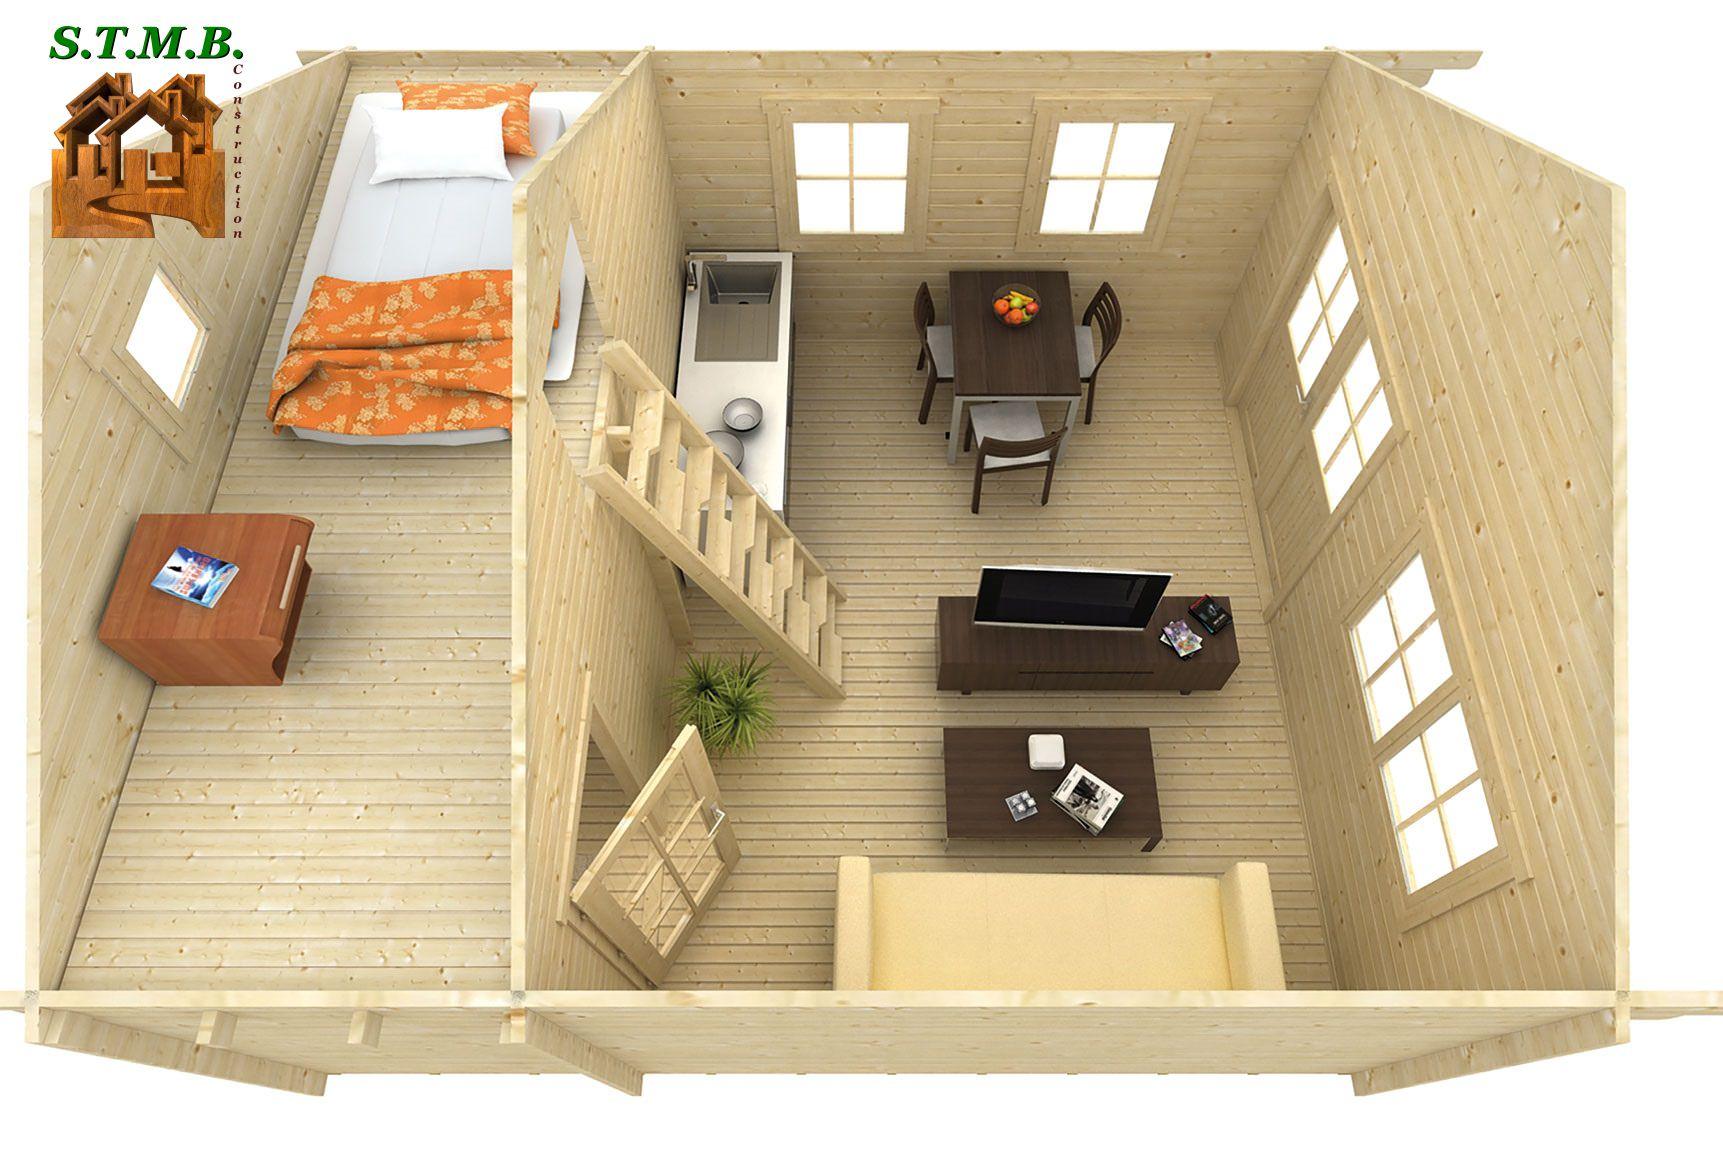 Comment r nover un jardin stmb construction for Deco slaapkamer chalet